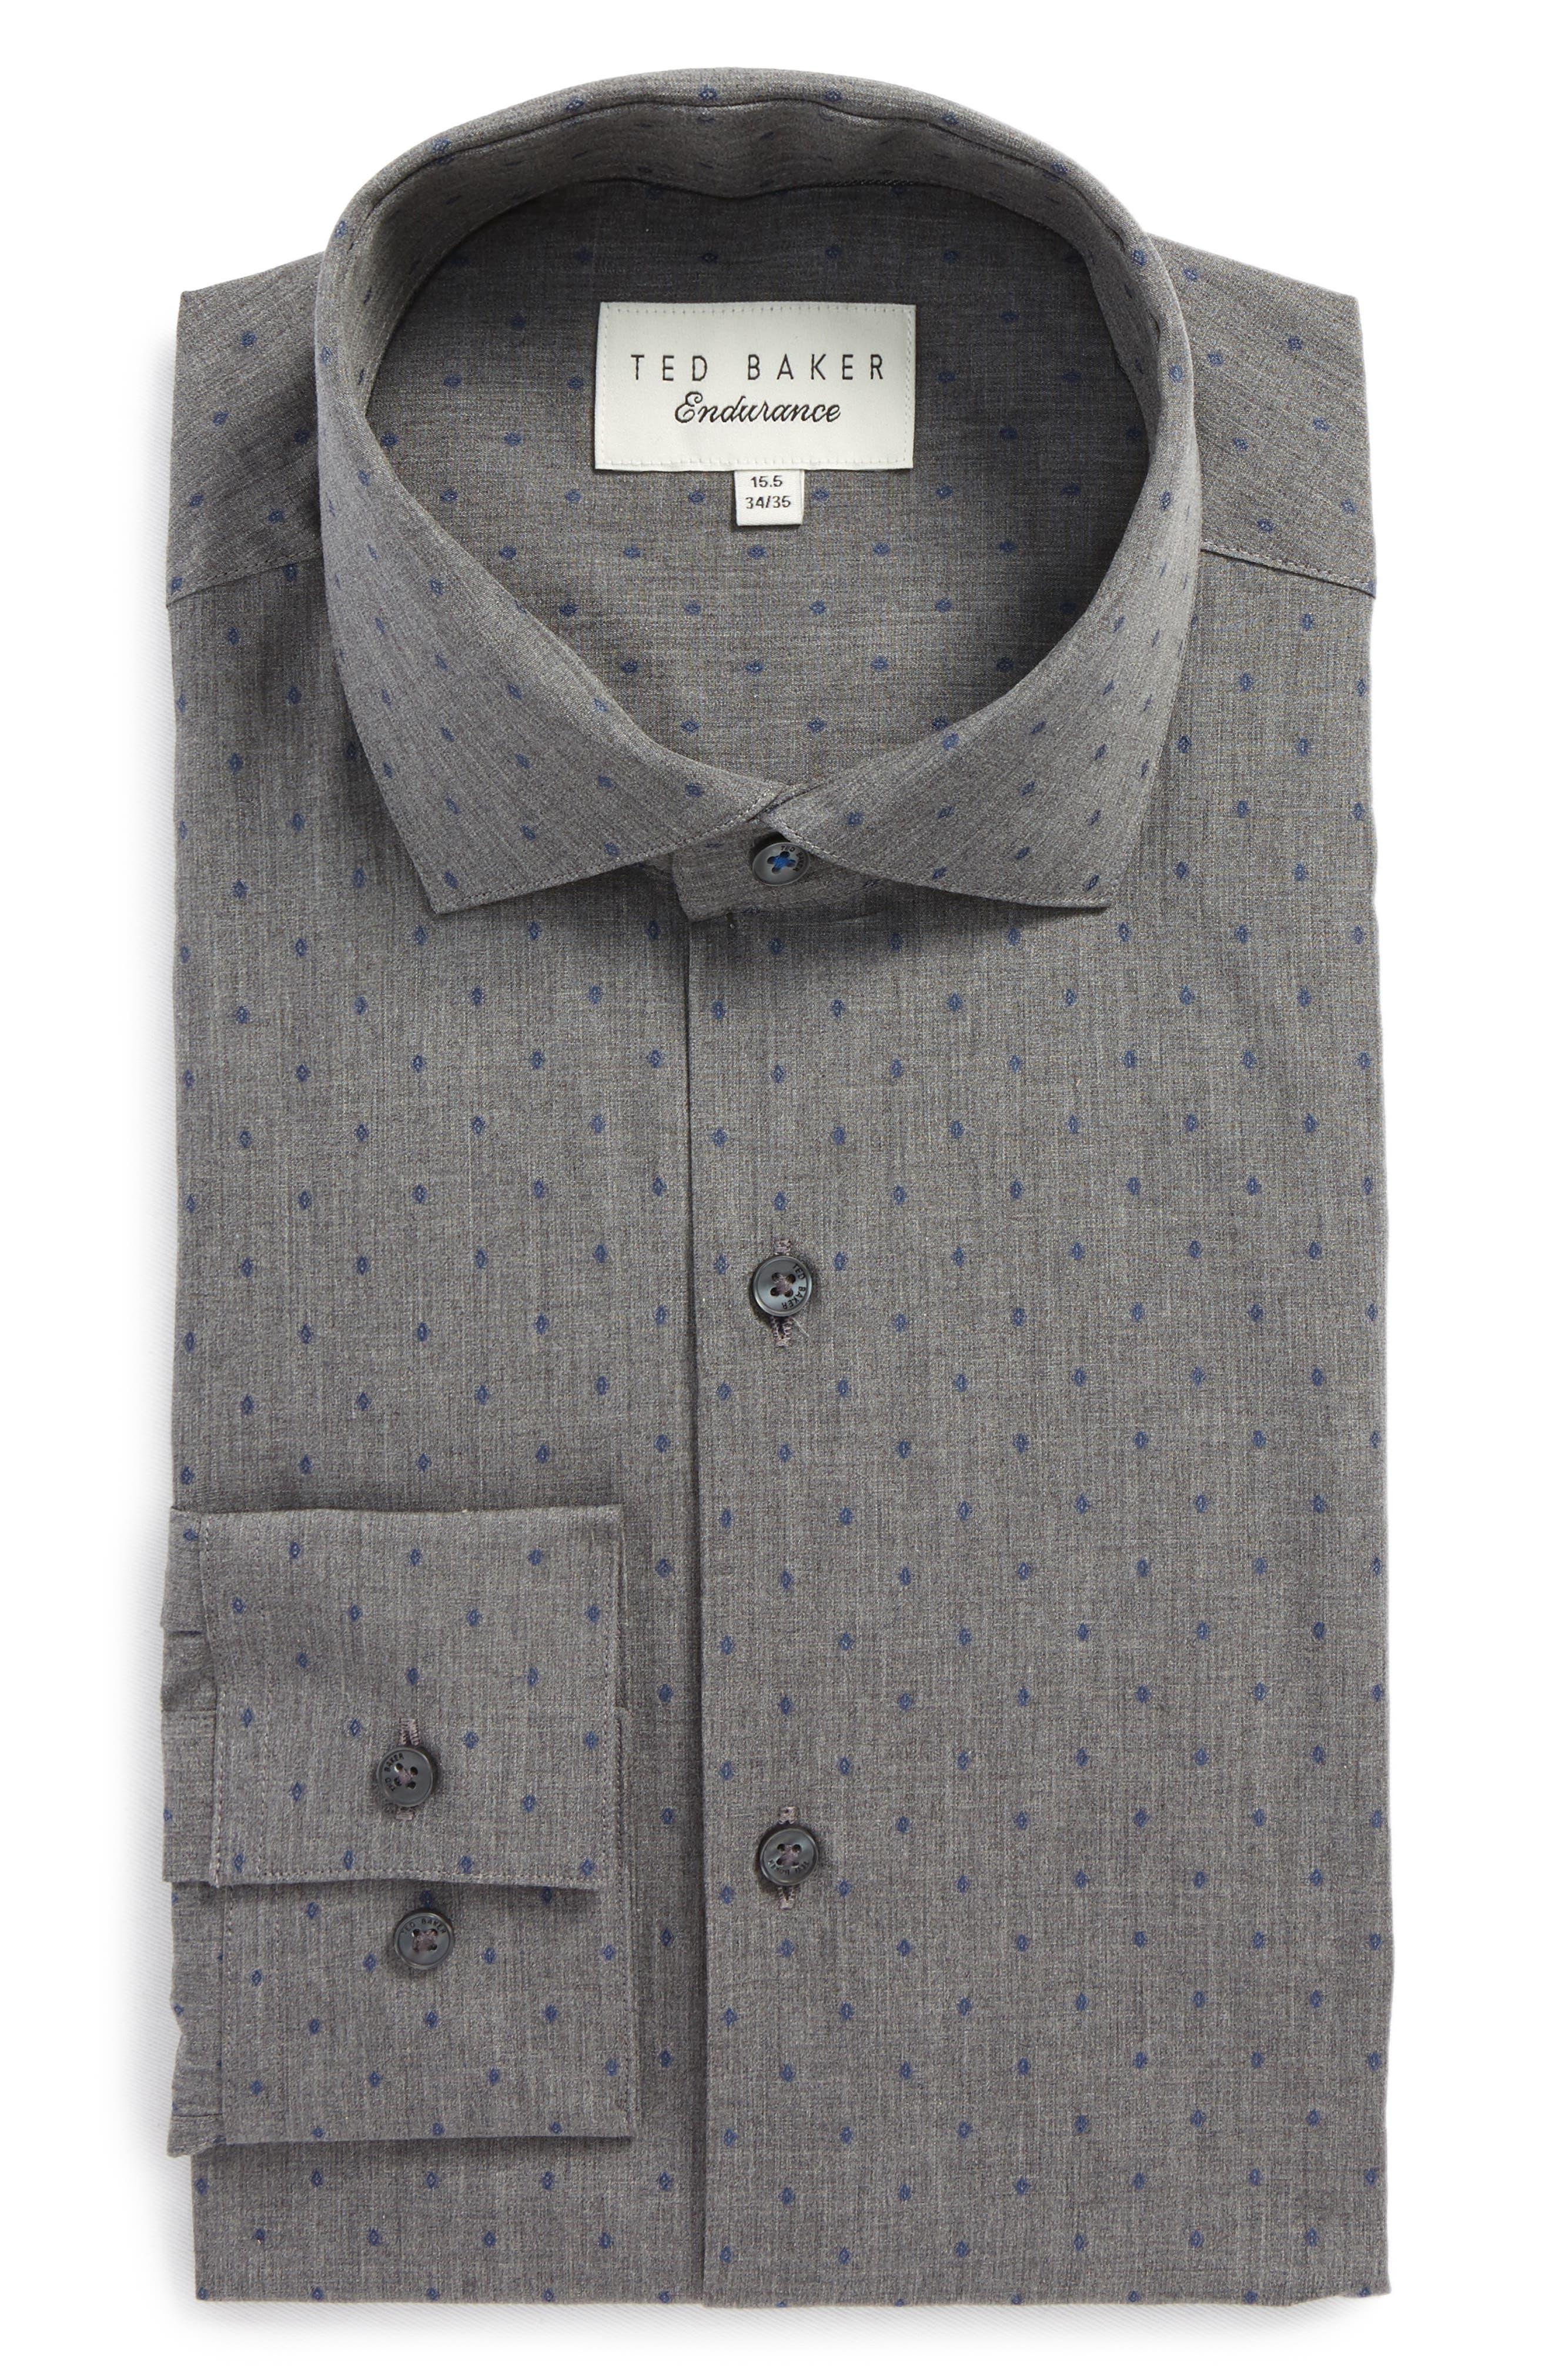 Ted Baker London Endurance Tidies Trim Fit Print Dress Shirt